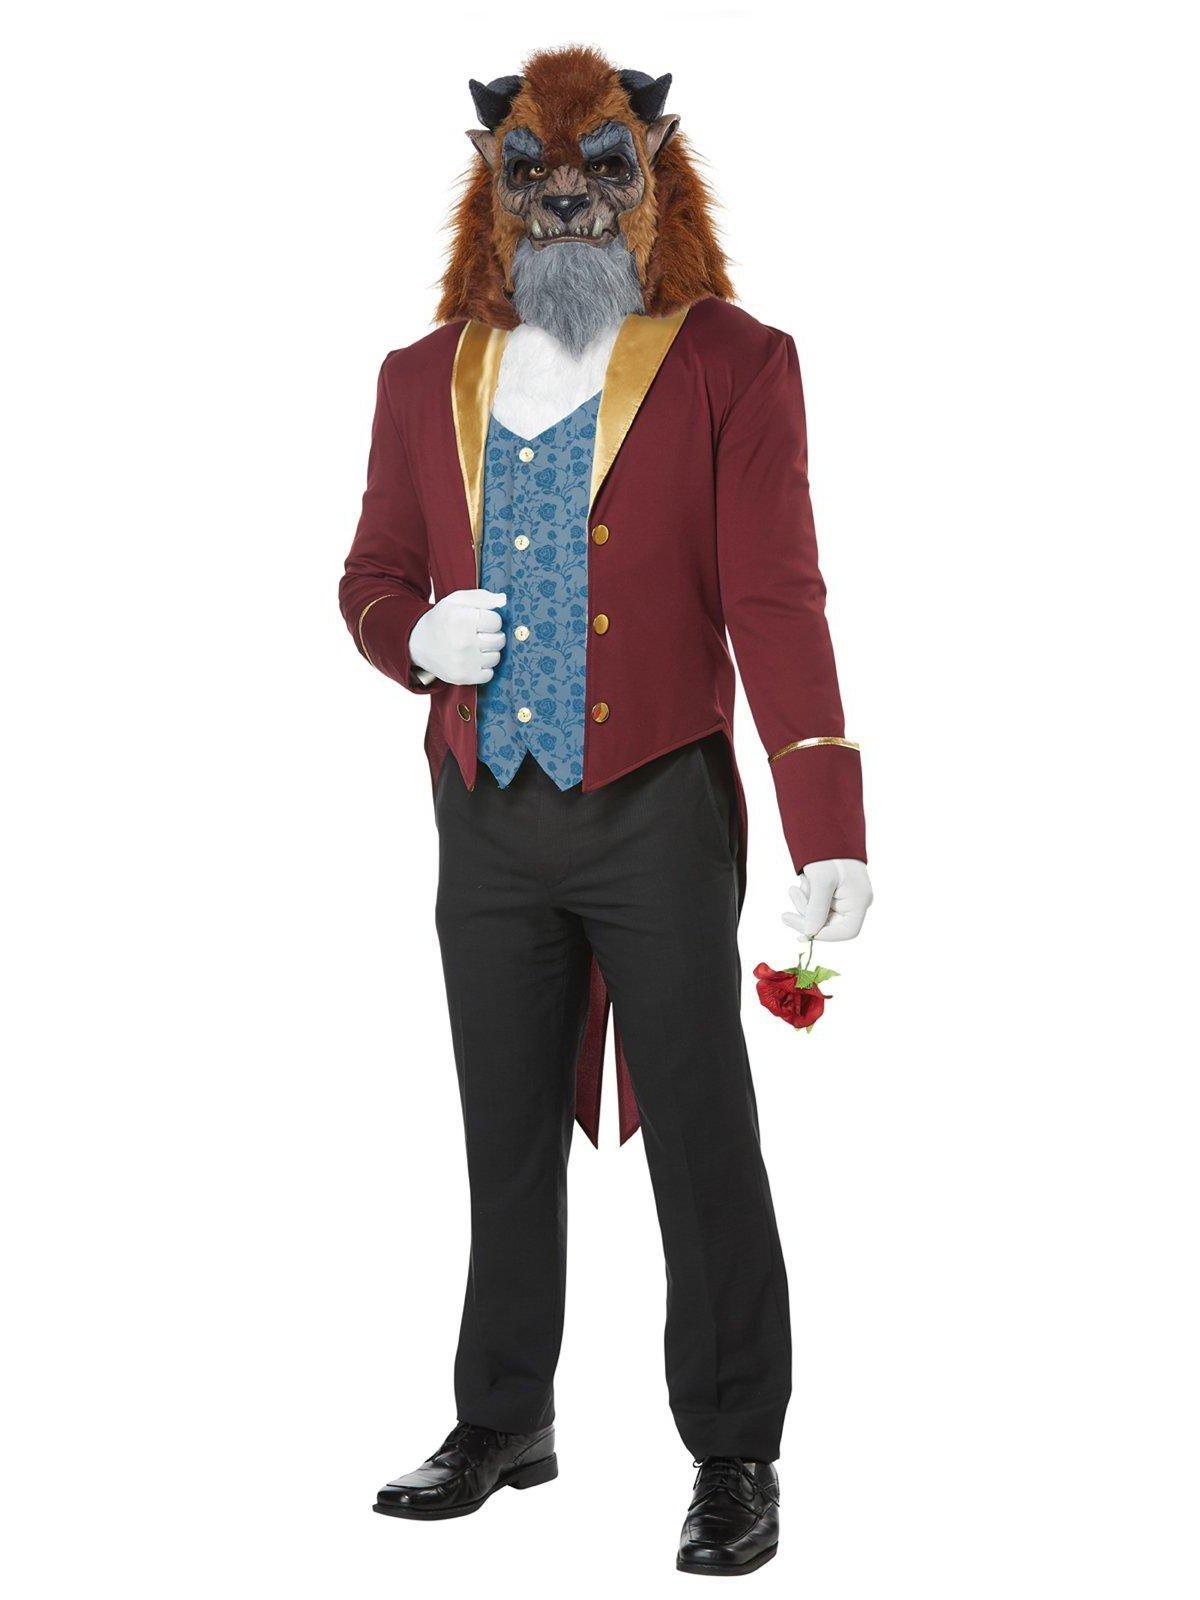 California Costumes Men's Storybook Beast Adult Man Costume, Multi, Large